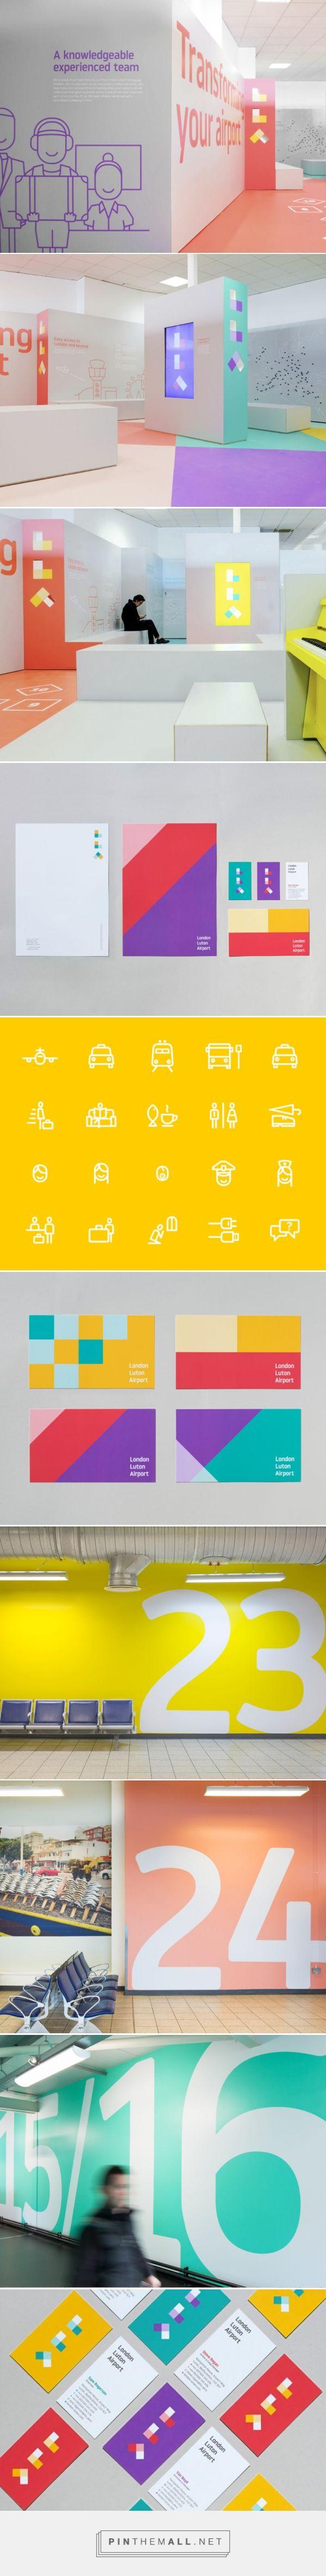 London Luton Airport Branding by Ico Design | Inspiration Grid | Design Inspiration http://theinspirationgrid.com/london-luton-airport-branding-by-ico-design/